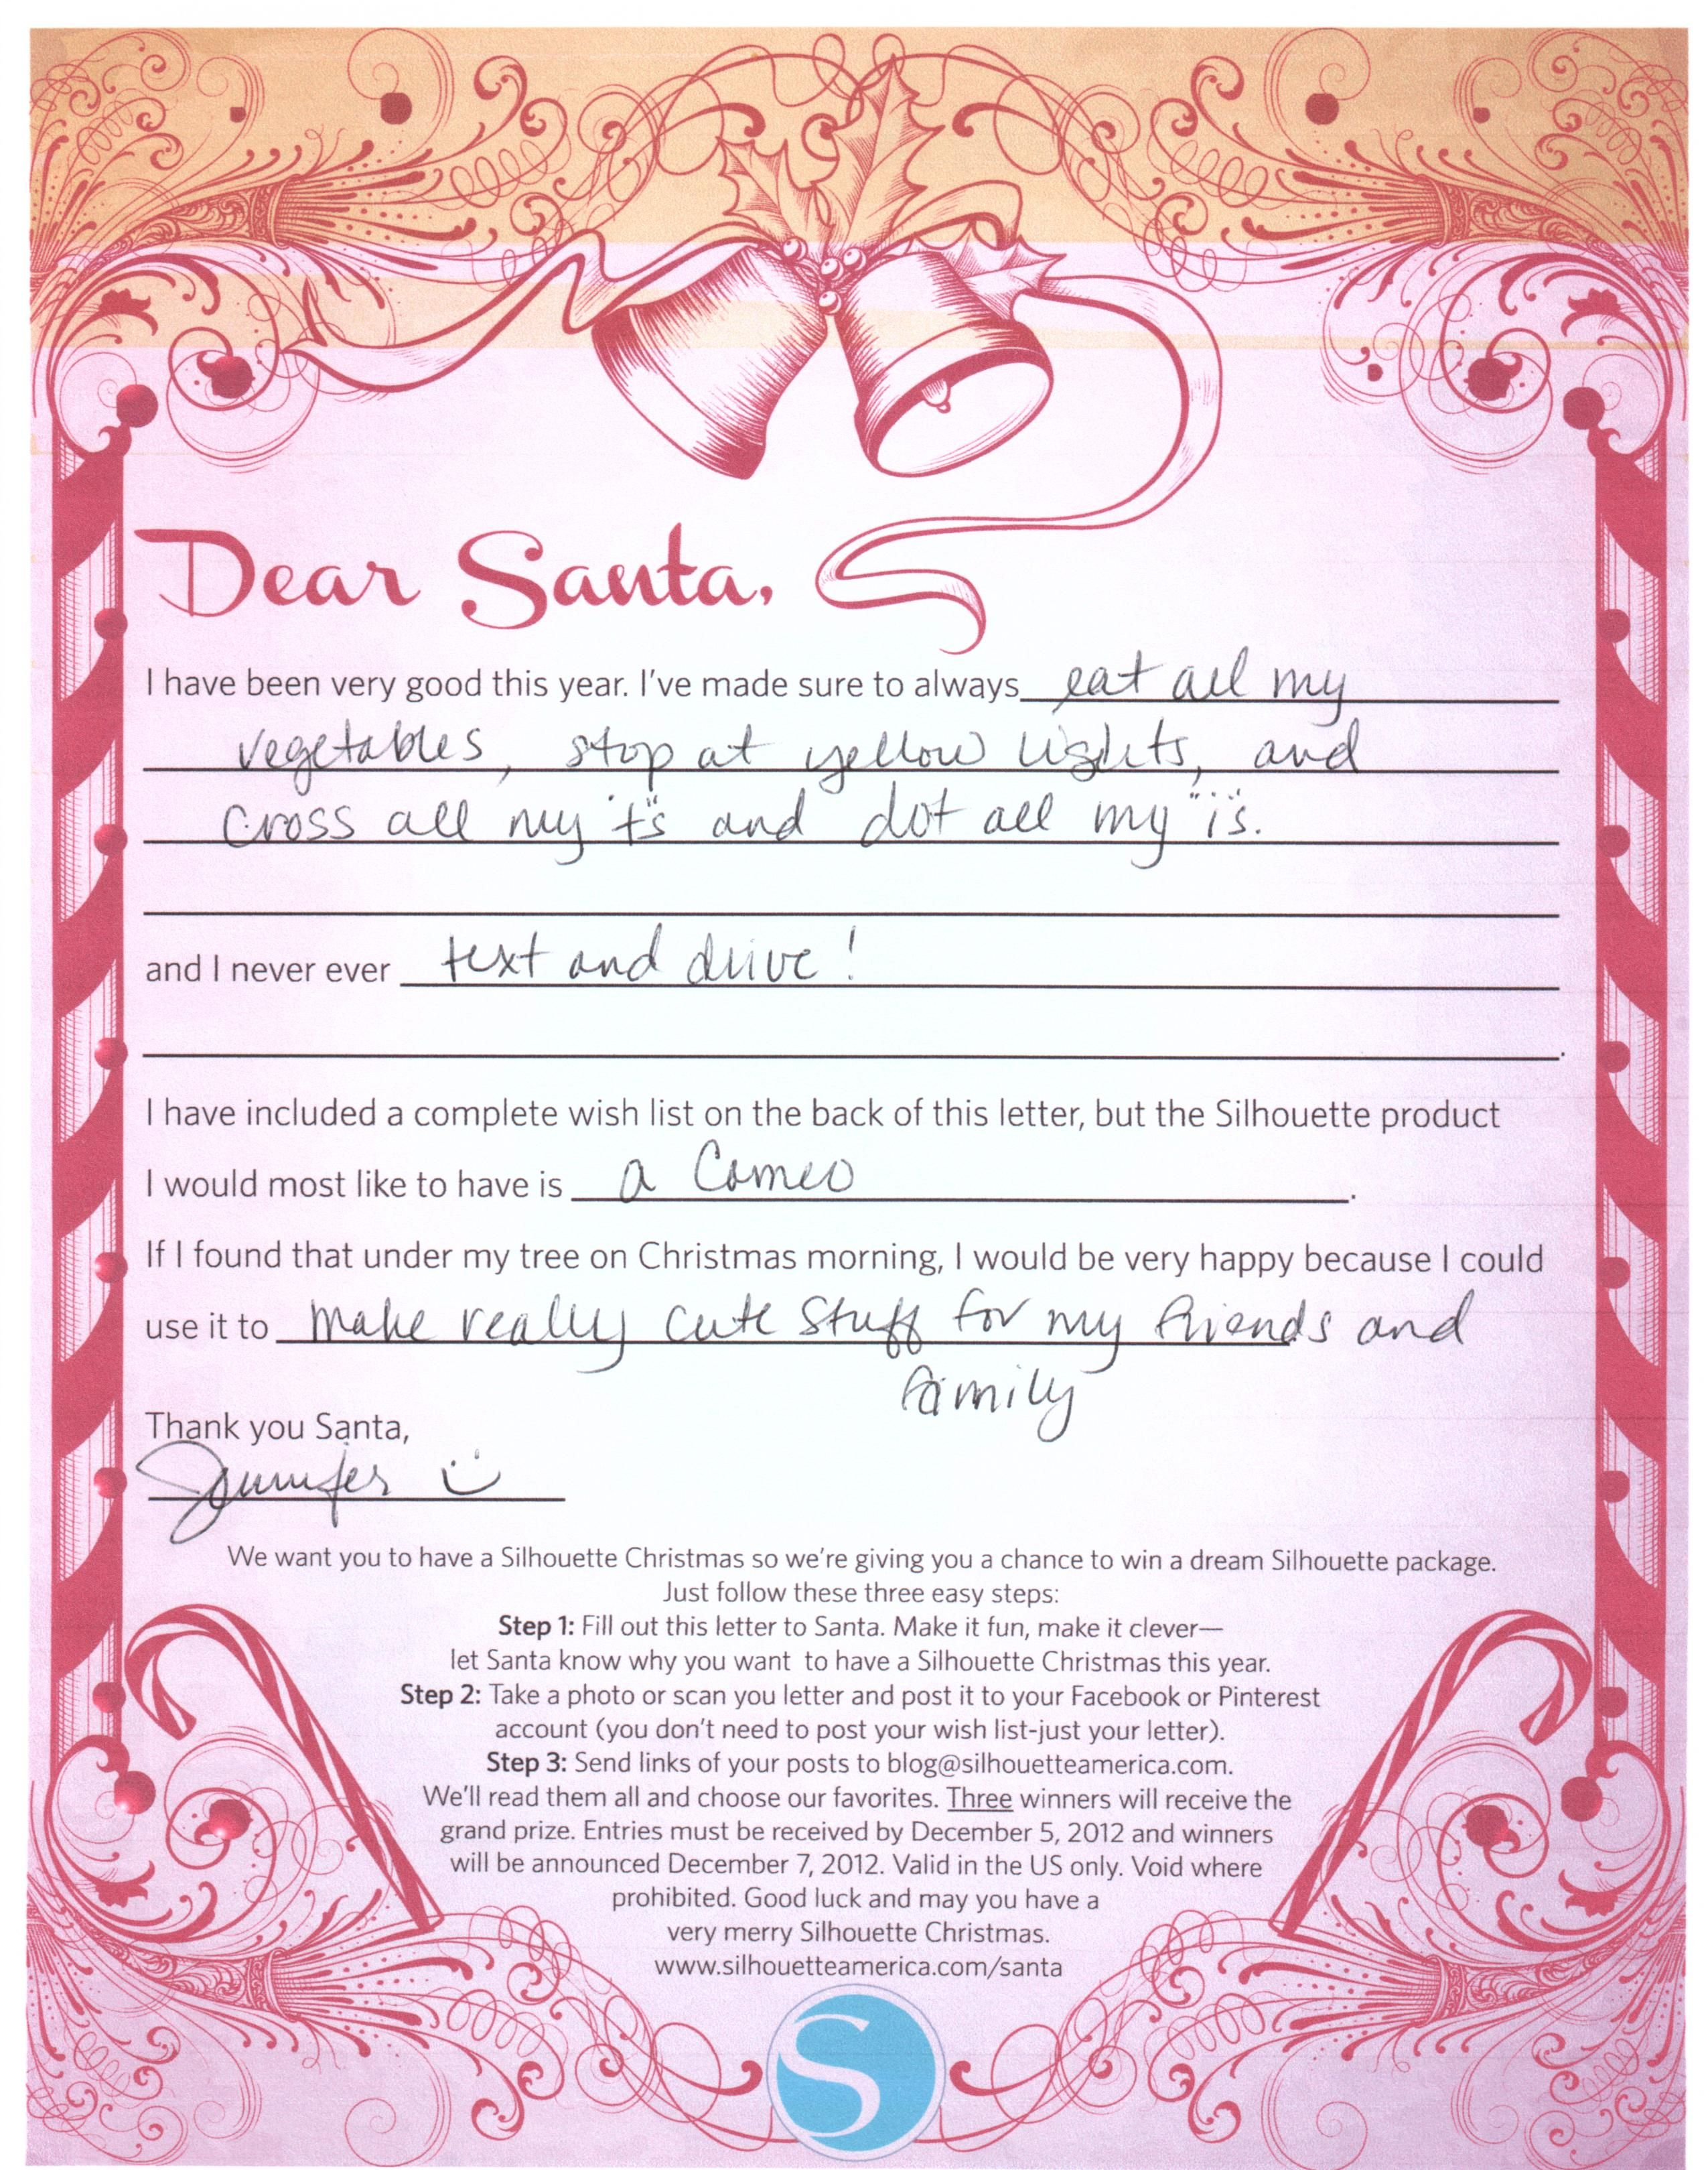 Letter to Santa Santa letter, Lettering, Dear santa